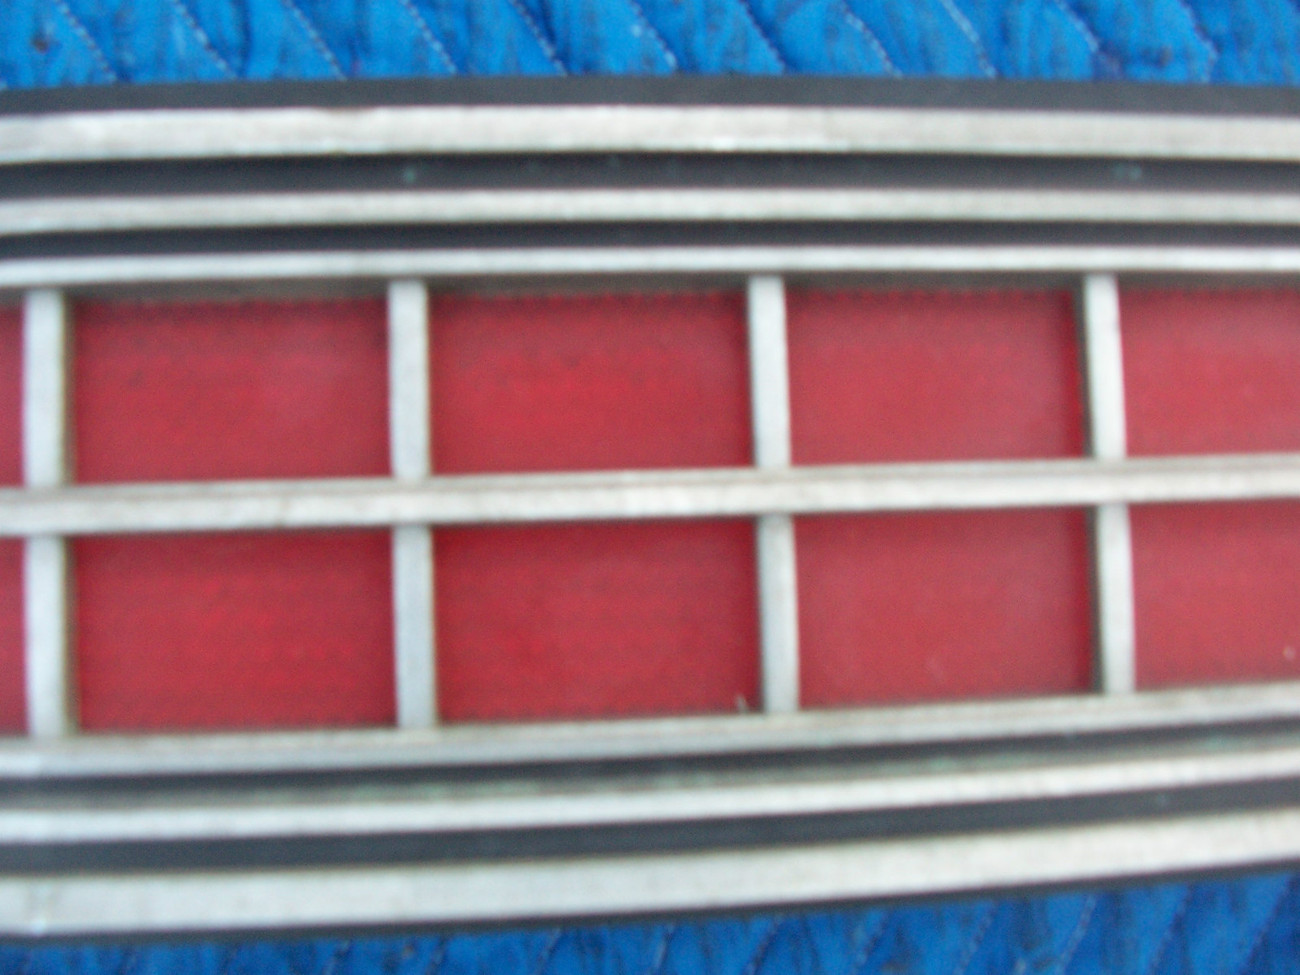 1973 MARQUIS 2 DOOR BROUGHAM CENTER TAILLIGHT REFLECTOR TRIM PANEL OEM USED ORIG image 6